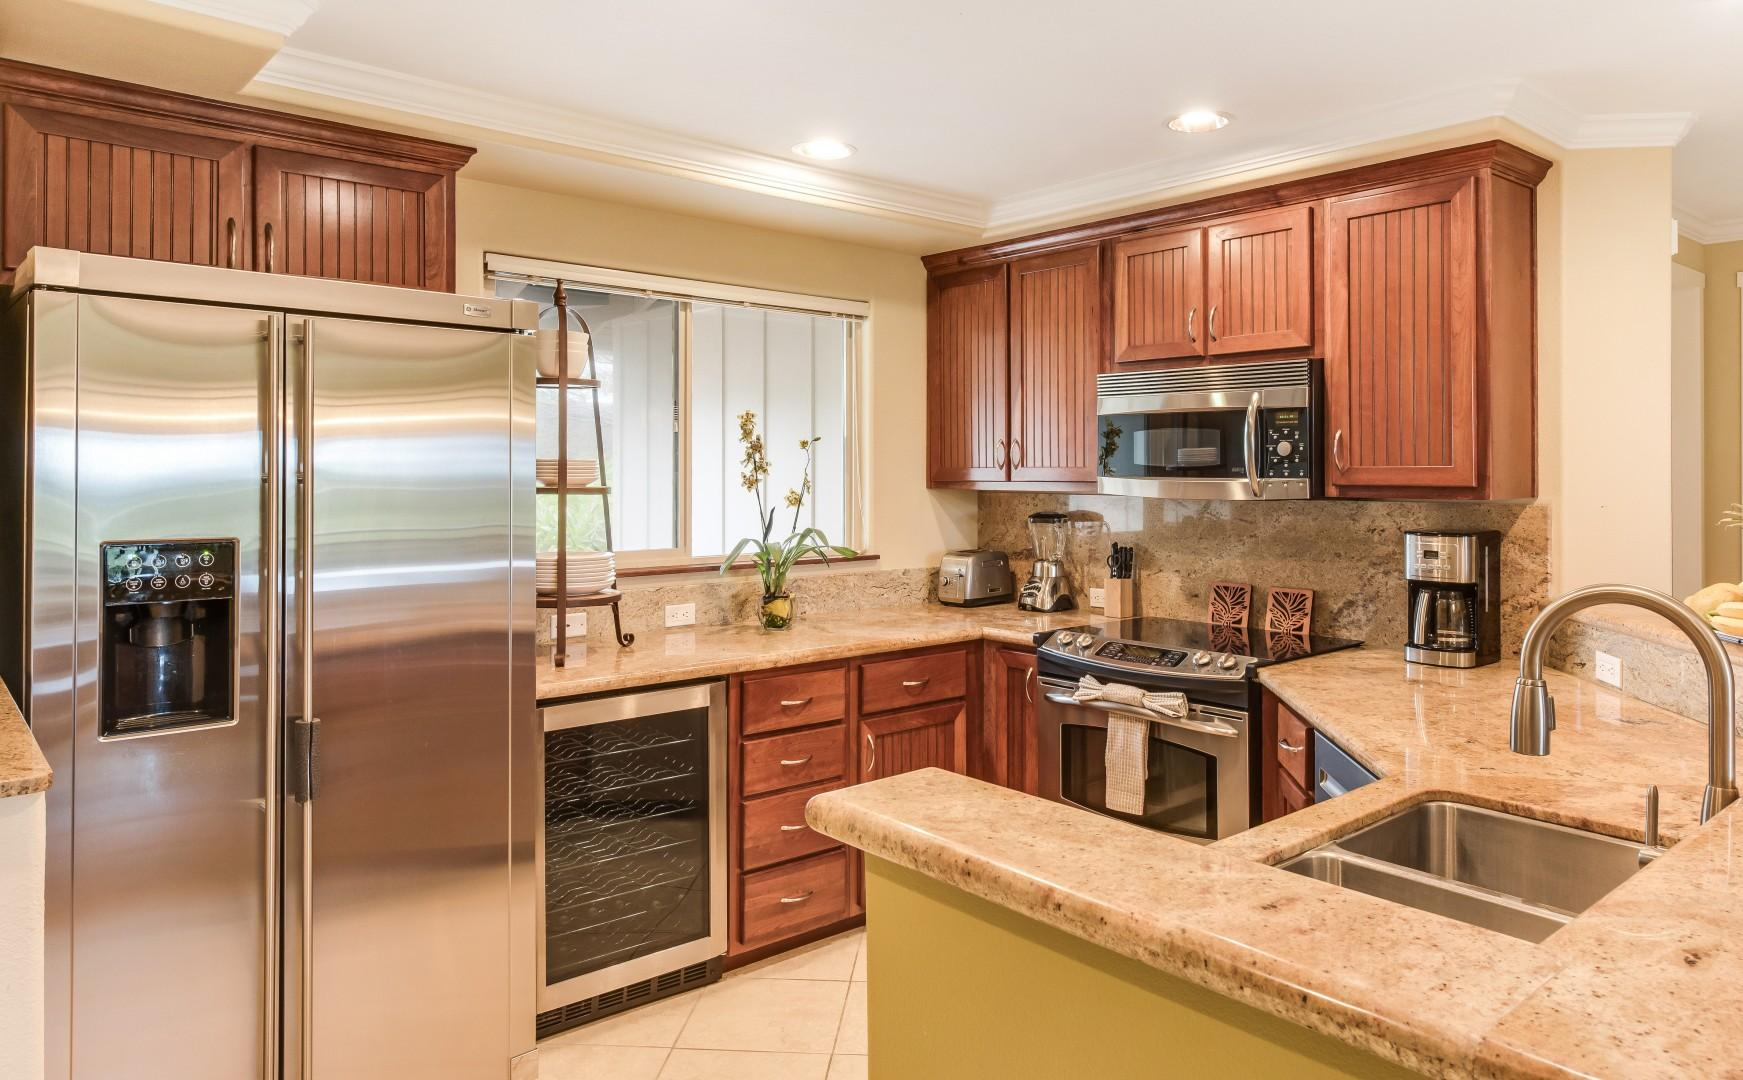 Kitchen w/ Wine Fridge and Granite Counter Tops